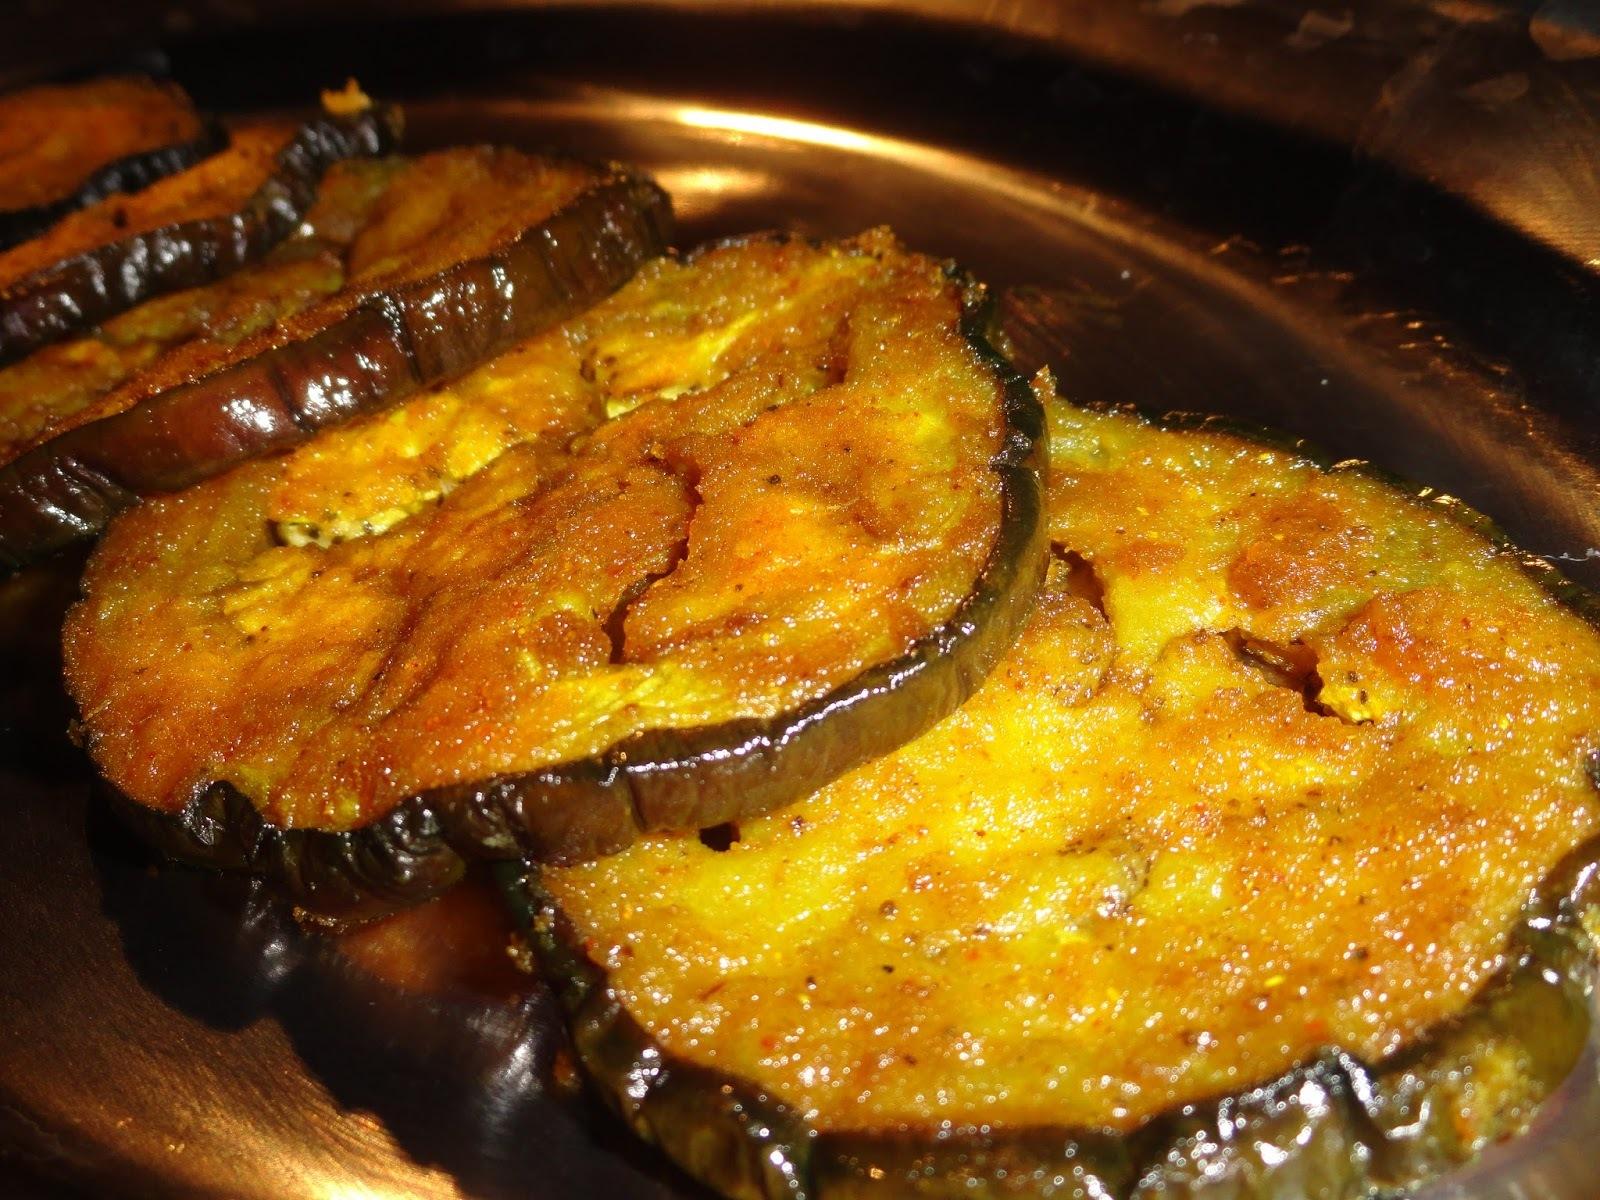 Brinjal/Eggplant/Baingan Tawa Fry